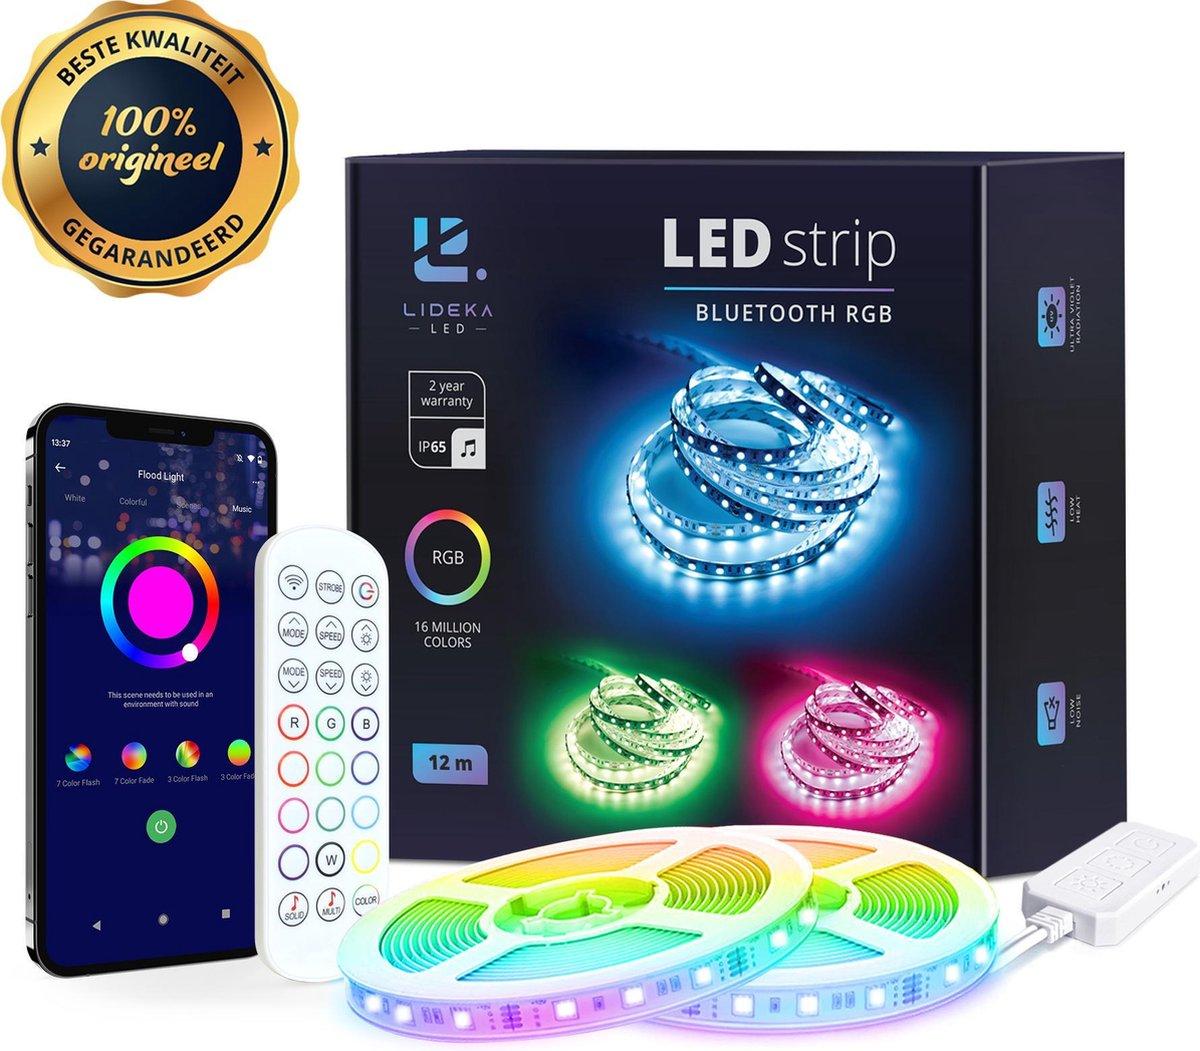 Lideka   Smart LED strip 10+2 Meter (2x6) met Afstandsbediening - Led Light Strip - RGB Licht strip